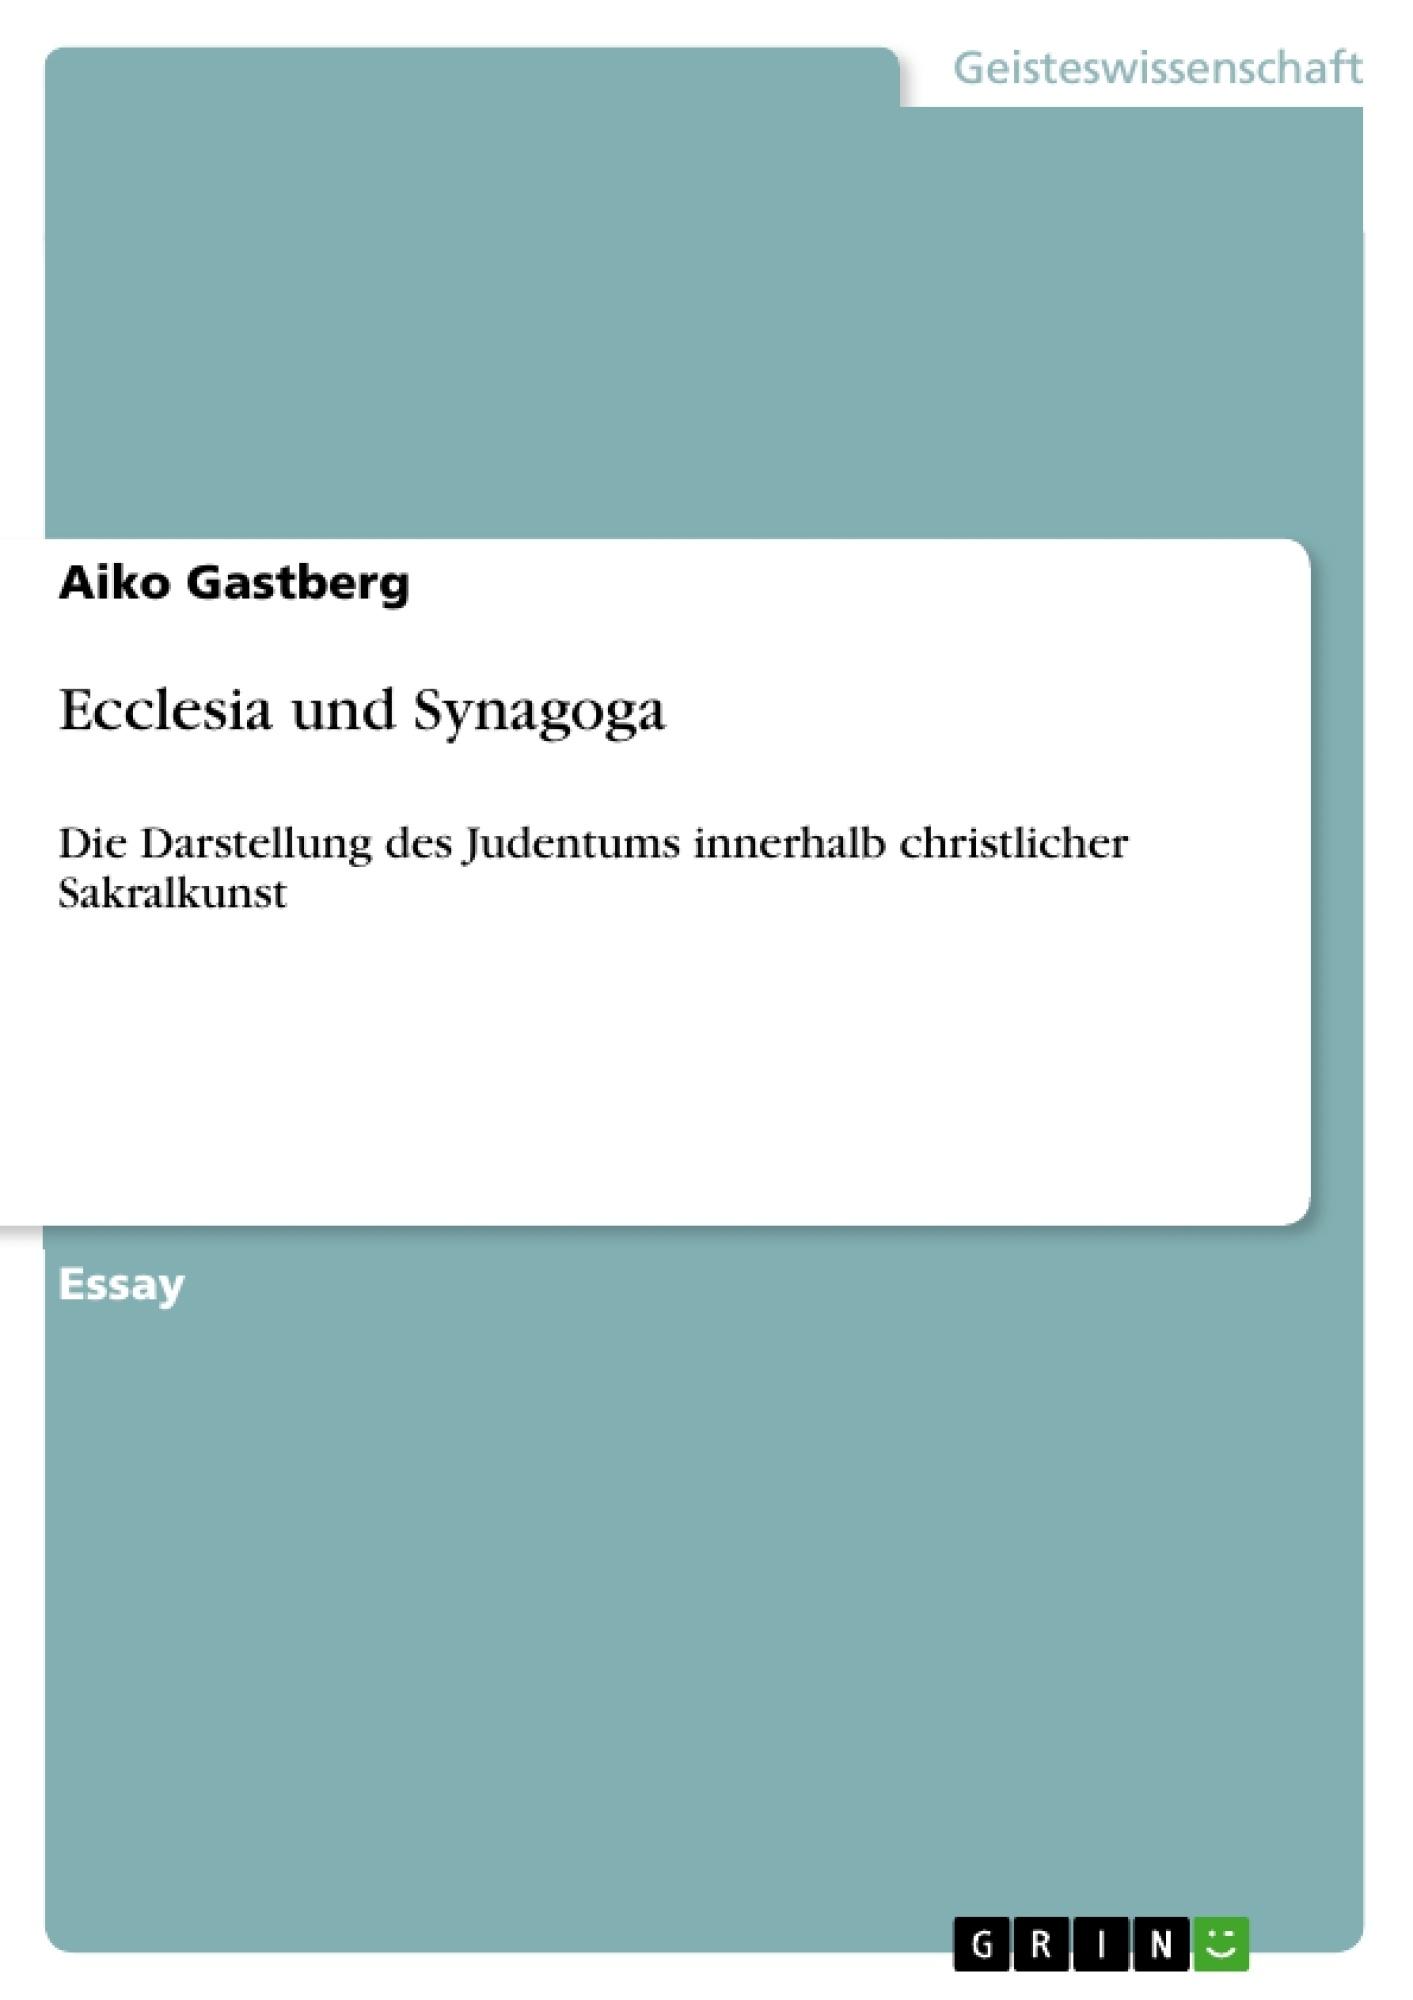 Titel: Ecclesia und Synagoga